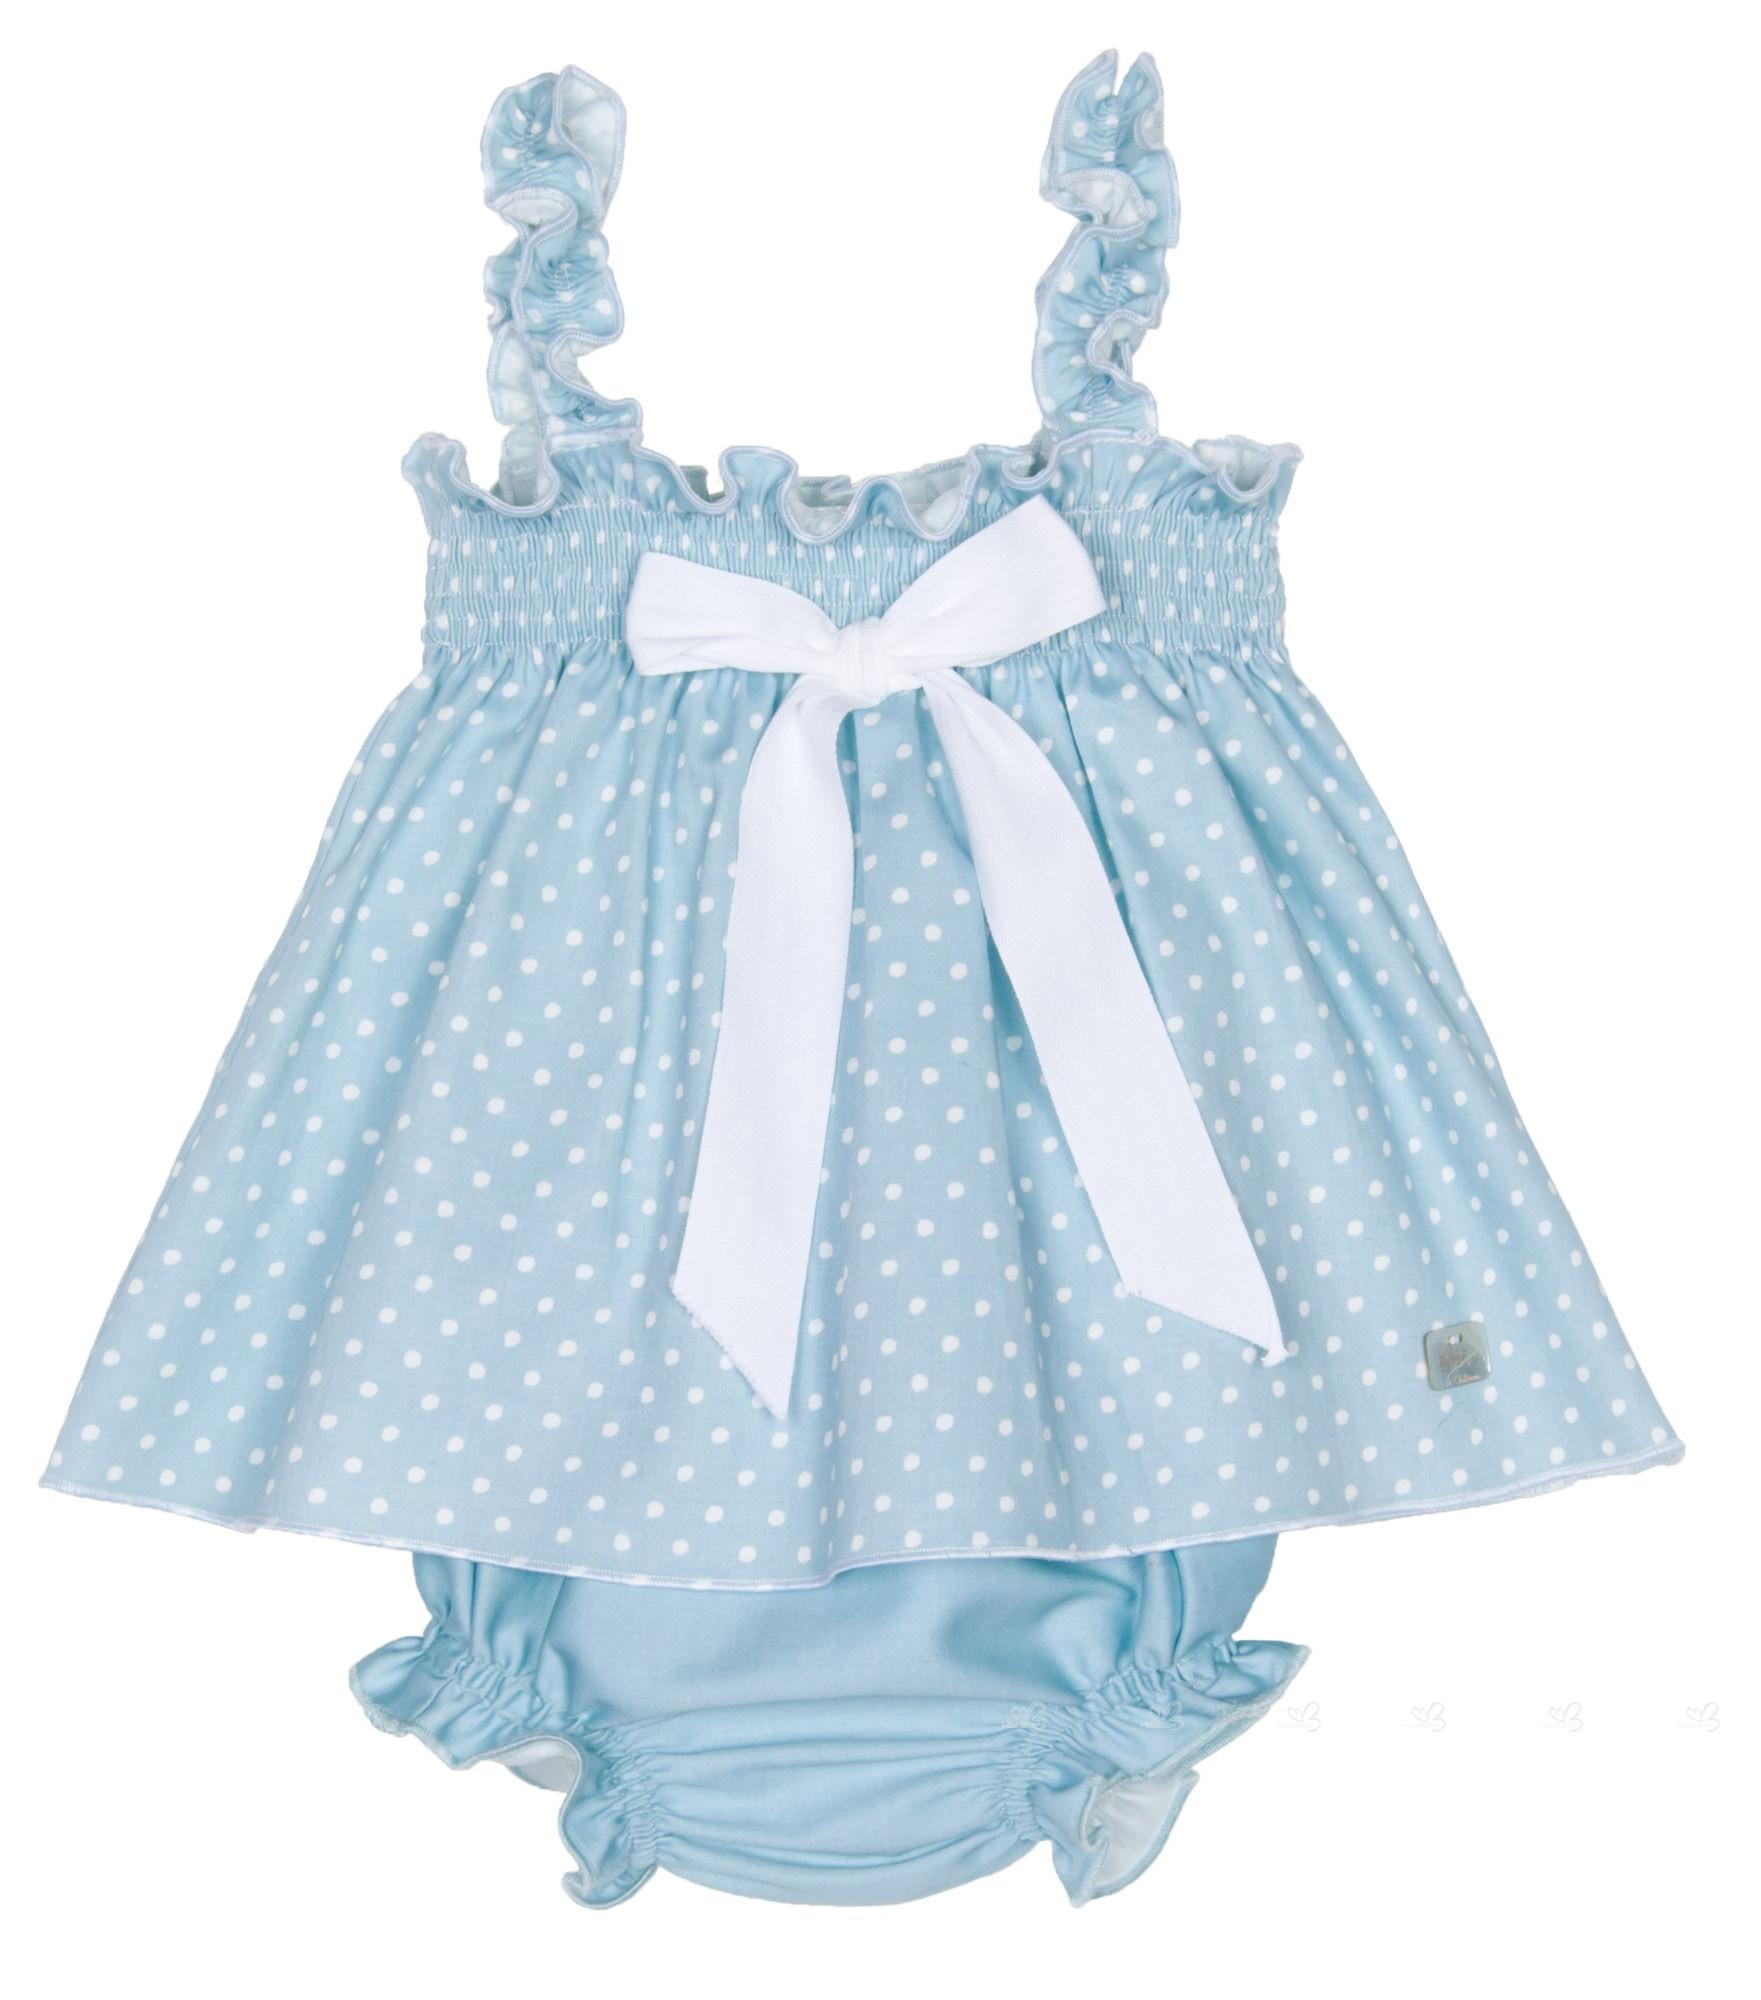 e71095cf3de9a Eve Children Conjunto Bebé Vestido Tirantes   Braguita Topitos Azul ...